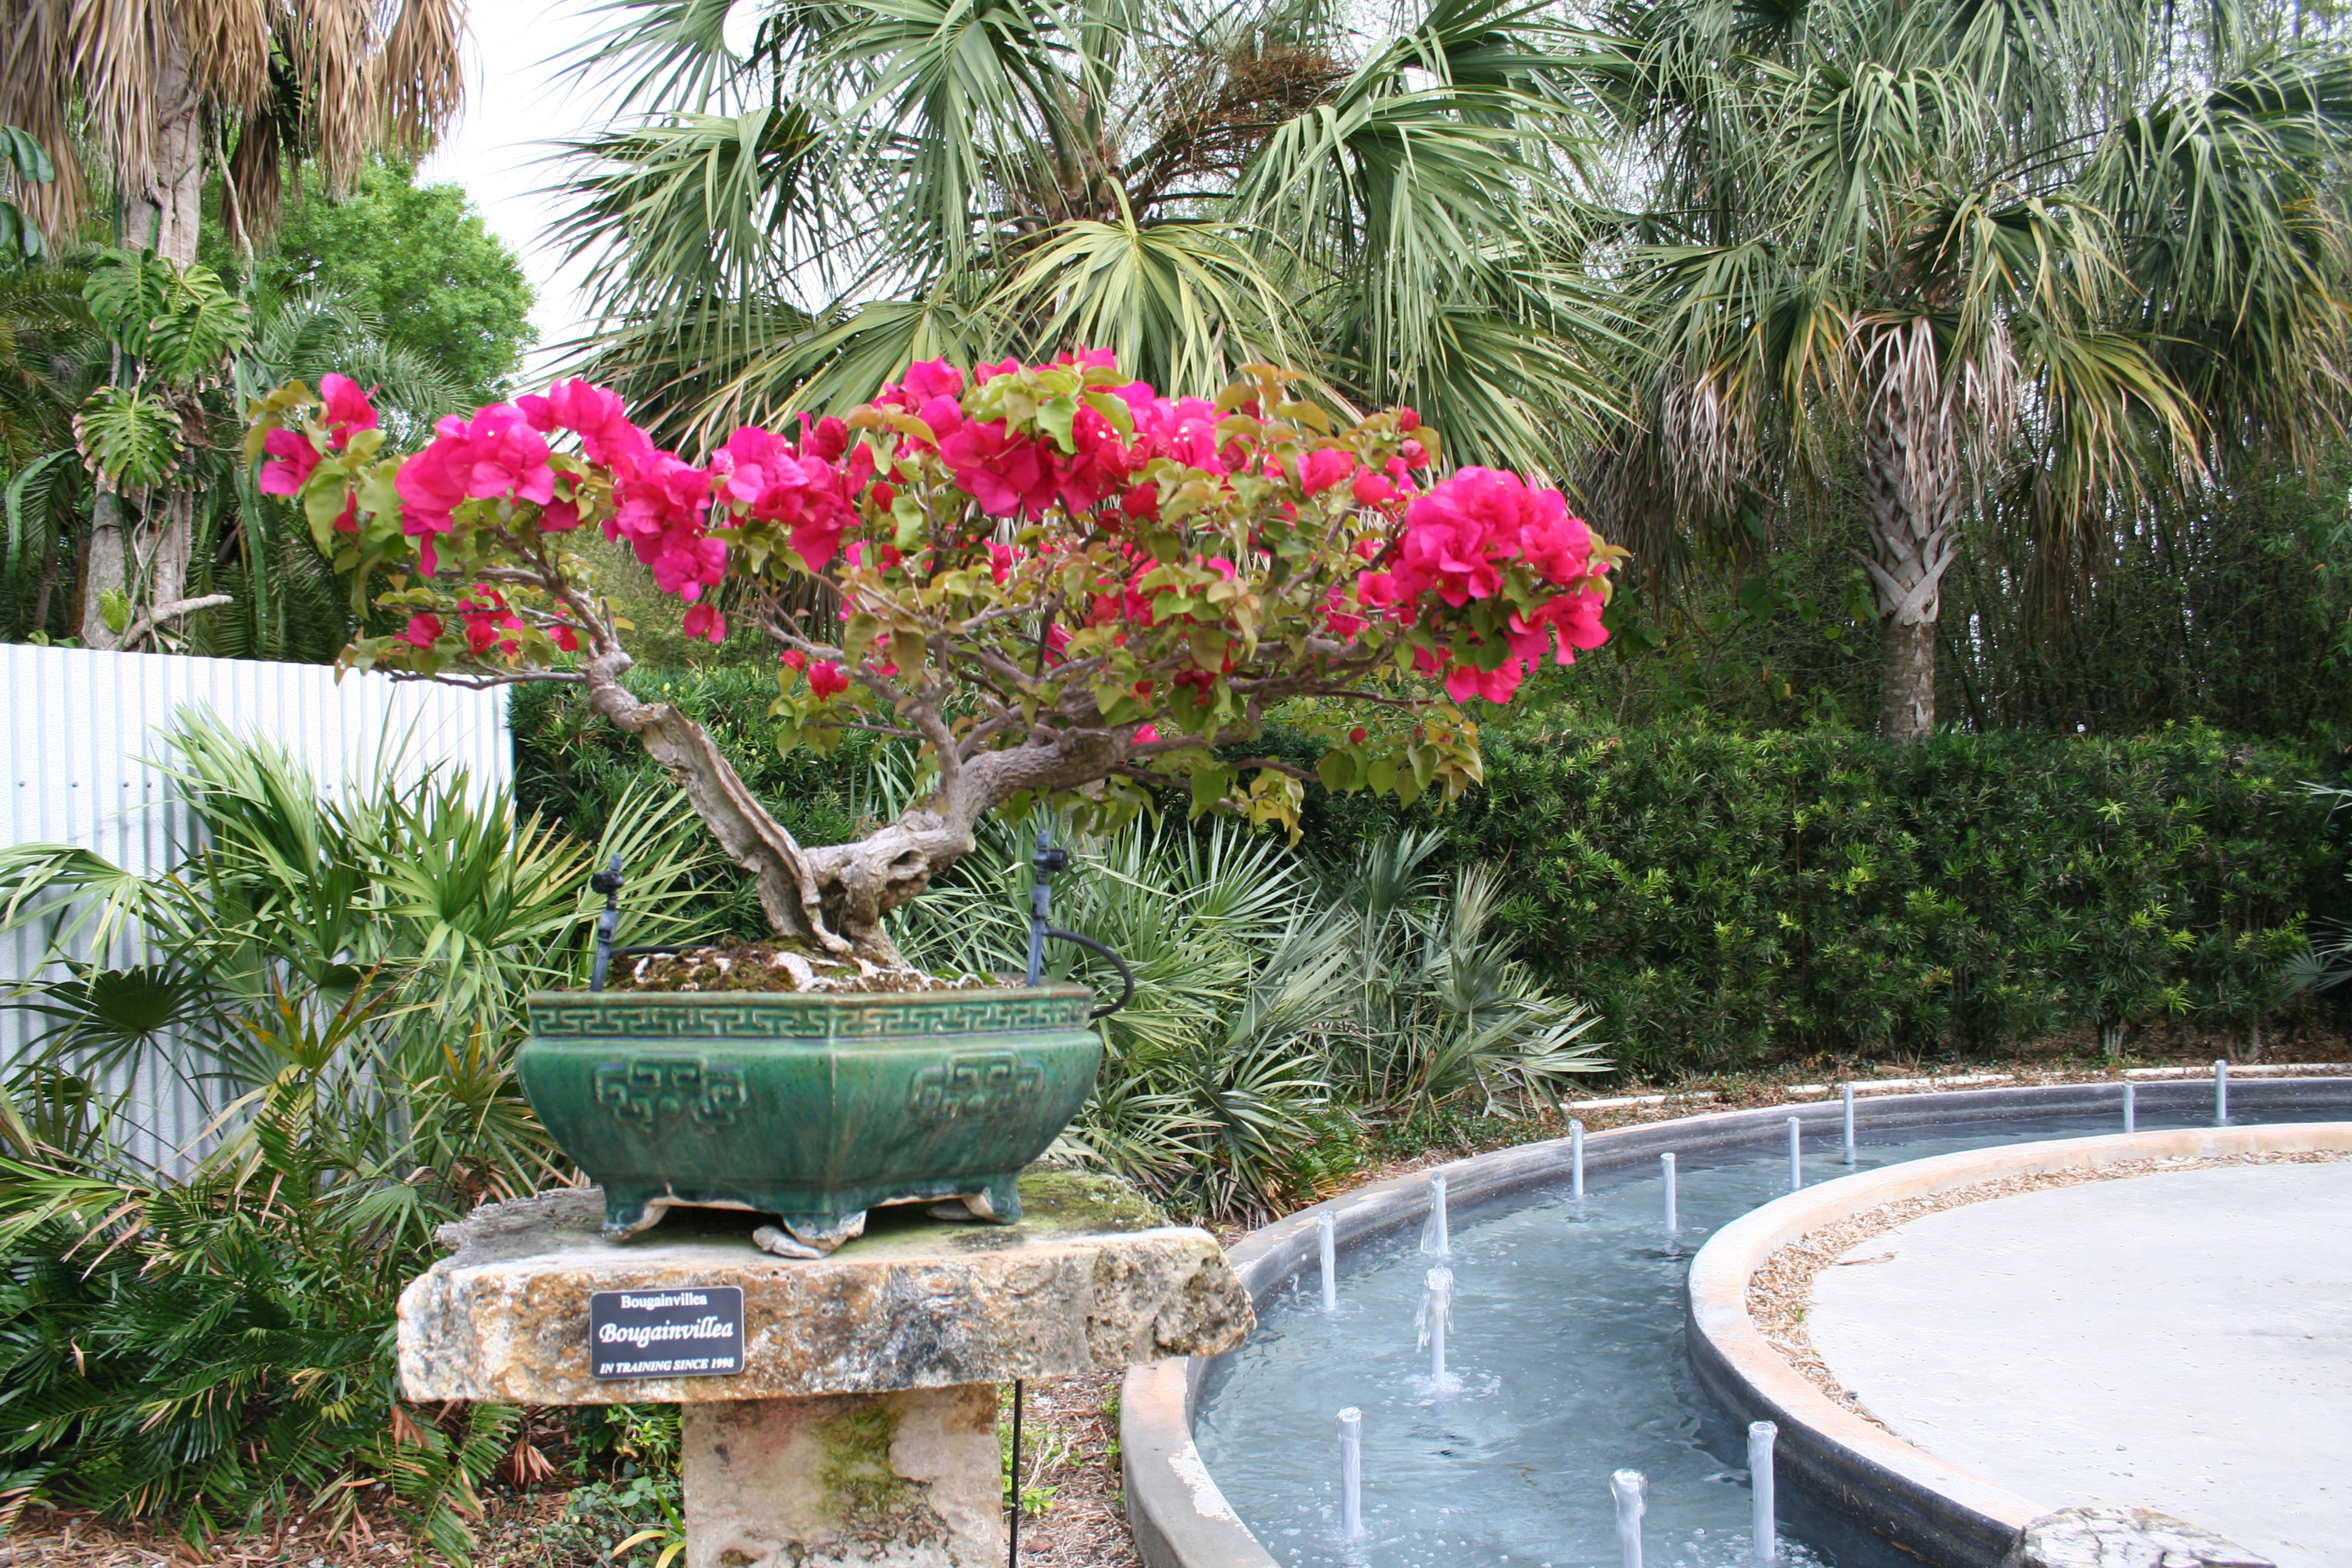 Heathcote Botanical Gardens: Feeling Festive For Fall